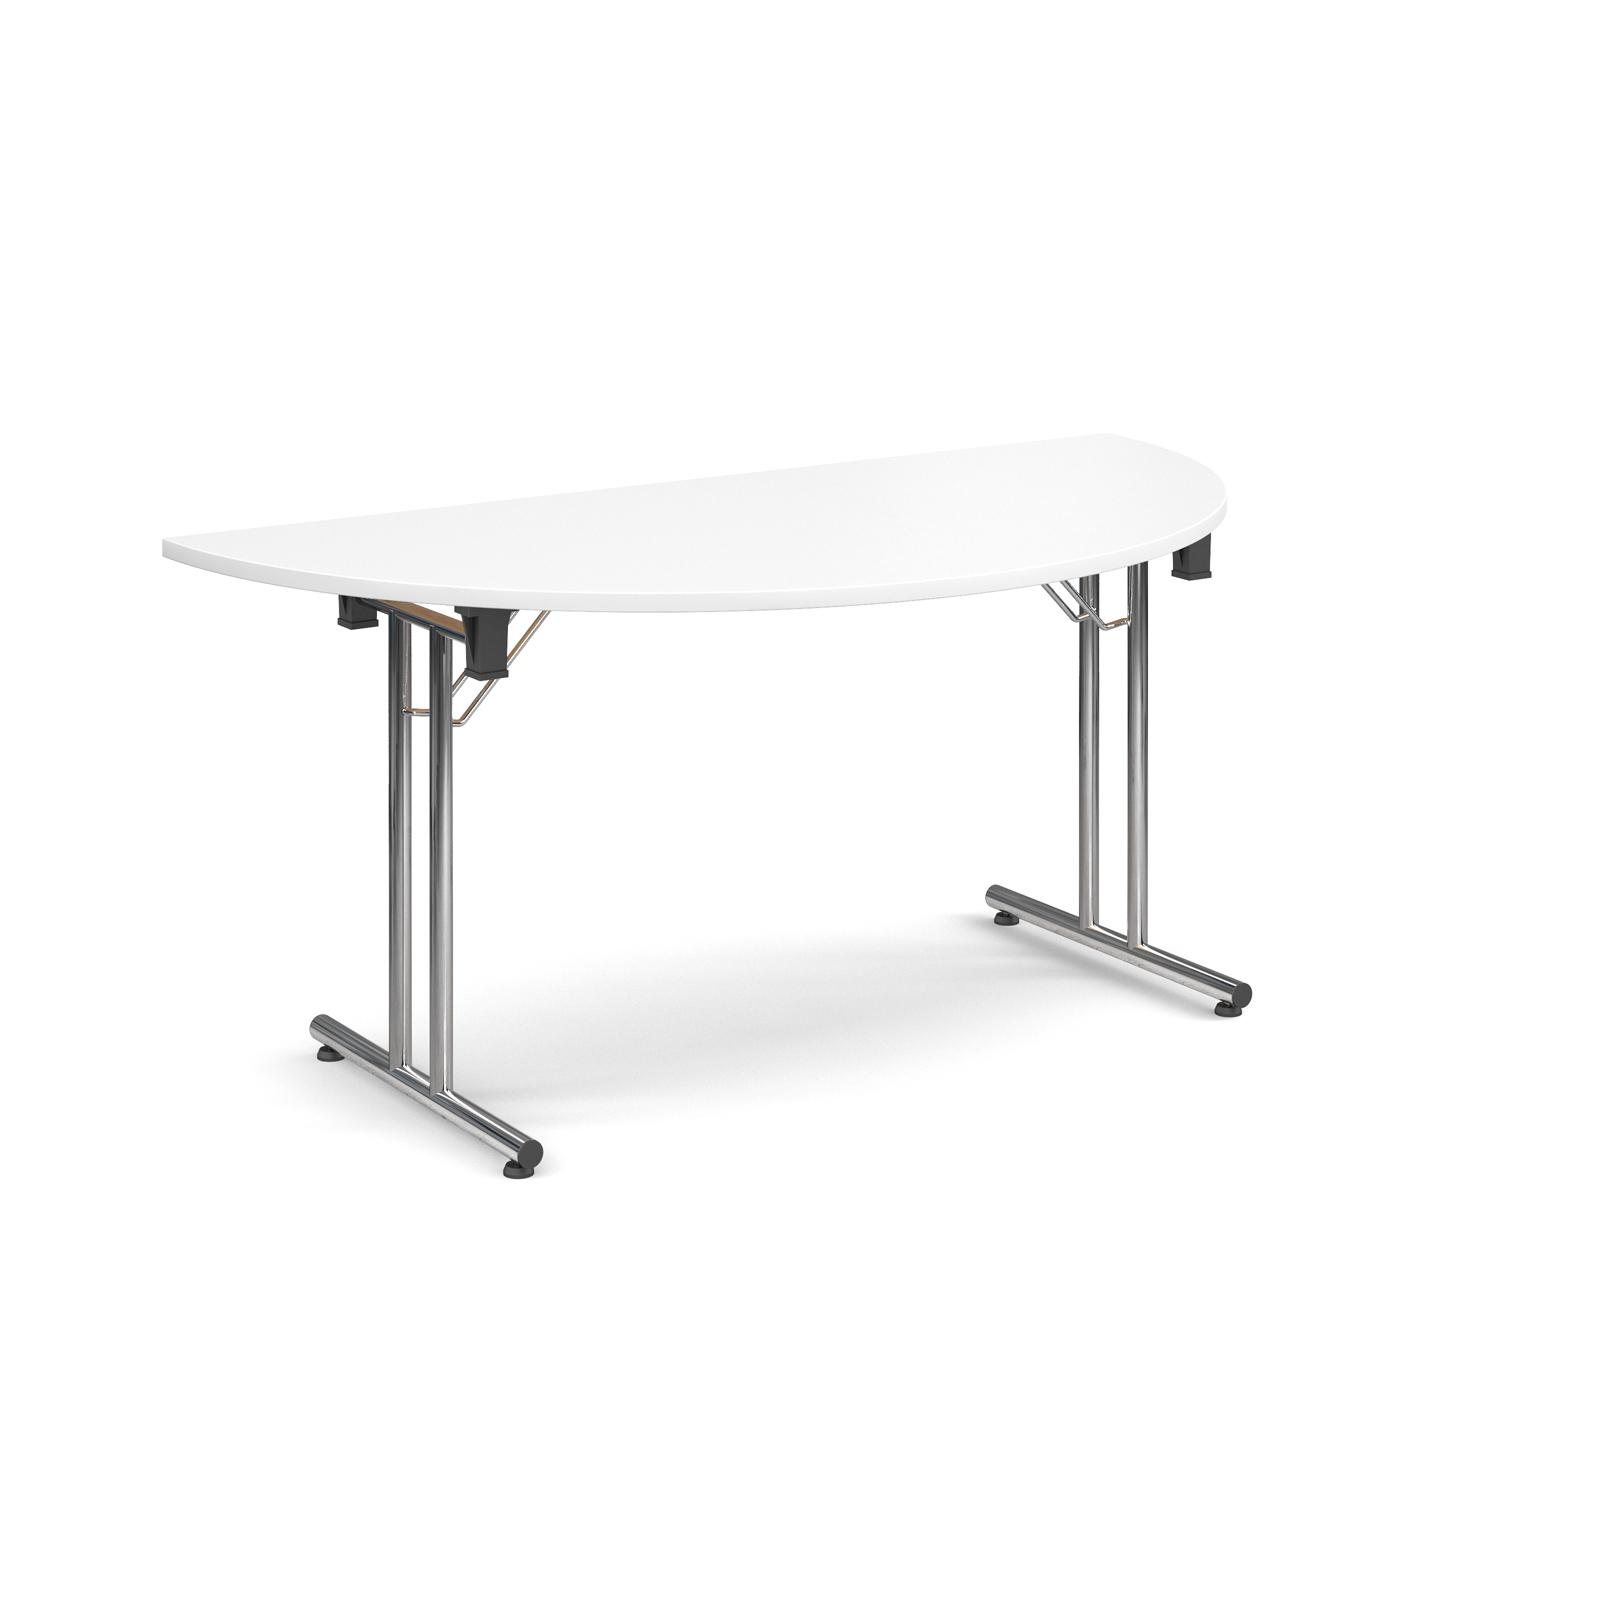 Semi circular deluxe folding leg table 1600mm x 800mm - white